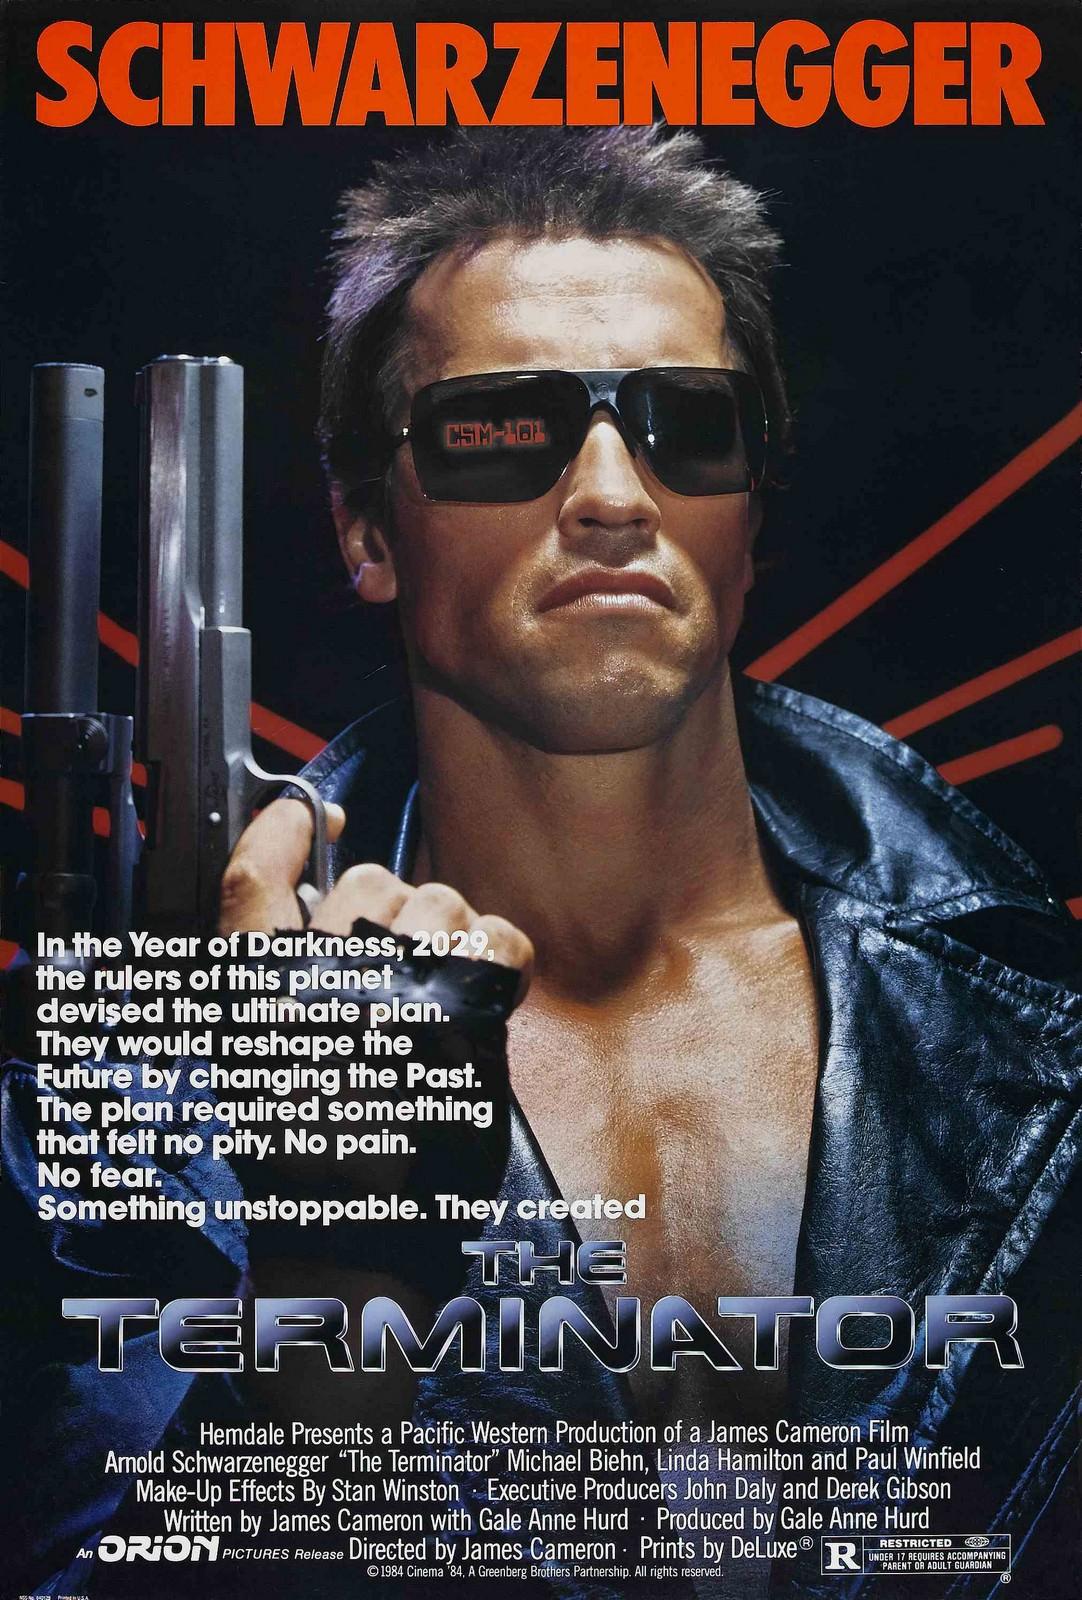 Movie, The Terminator(美國, 1985年) / 魔鬼終結者(台灣) / 未來戰士(香港) / 终结者(網路), 電影海報, 美國